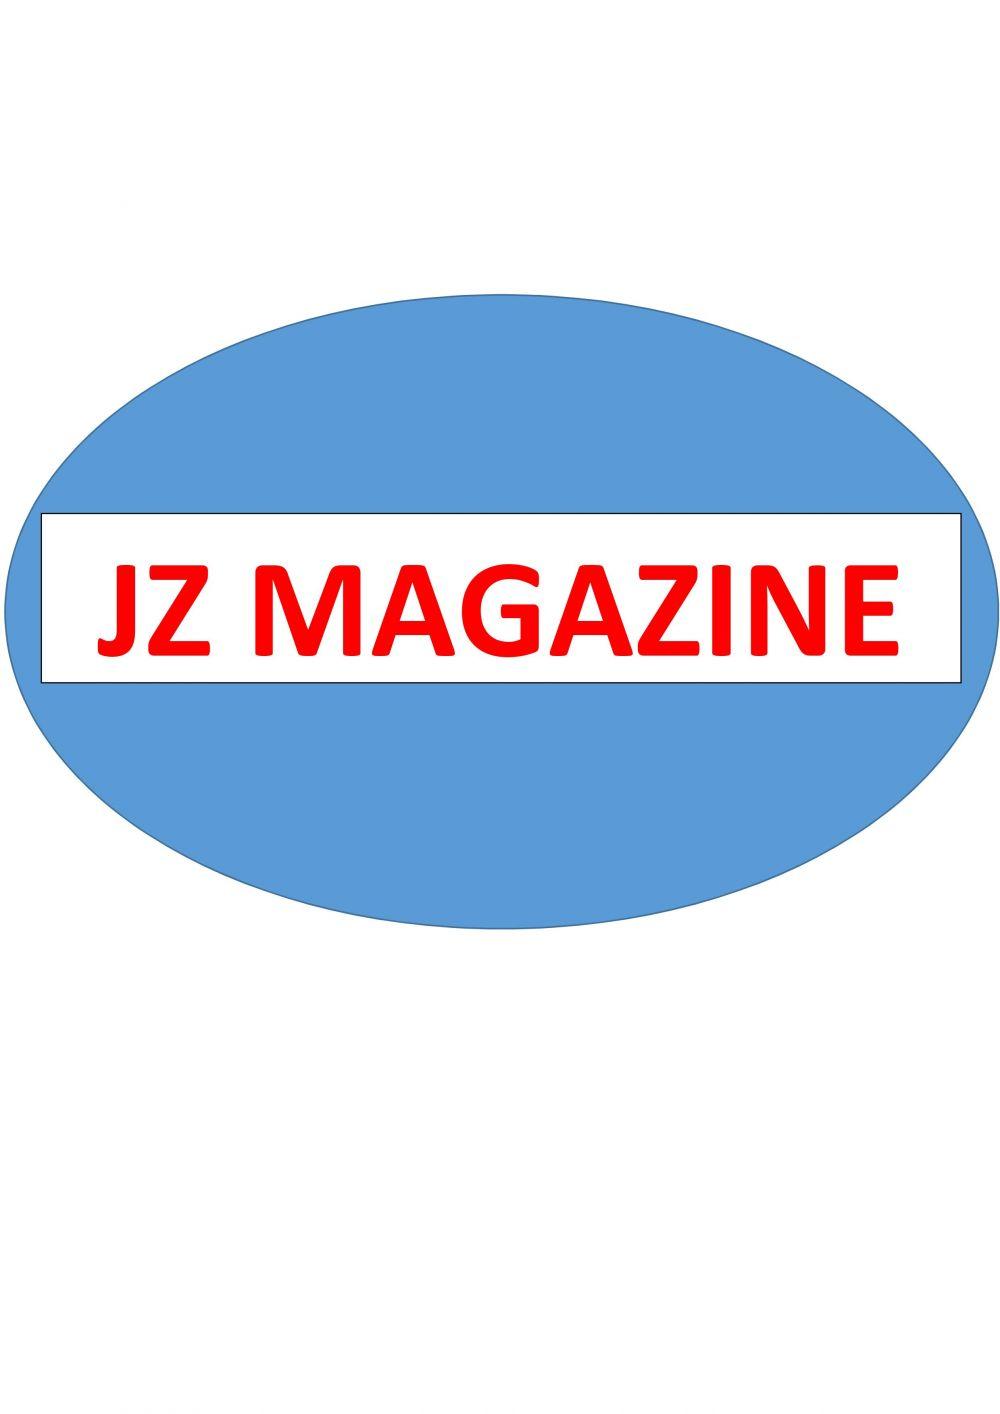 Jz magazine